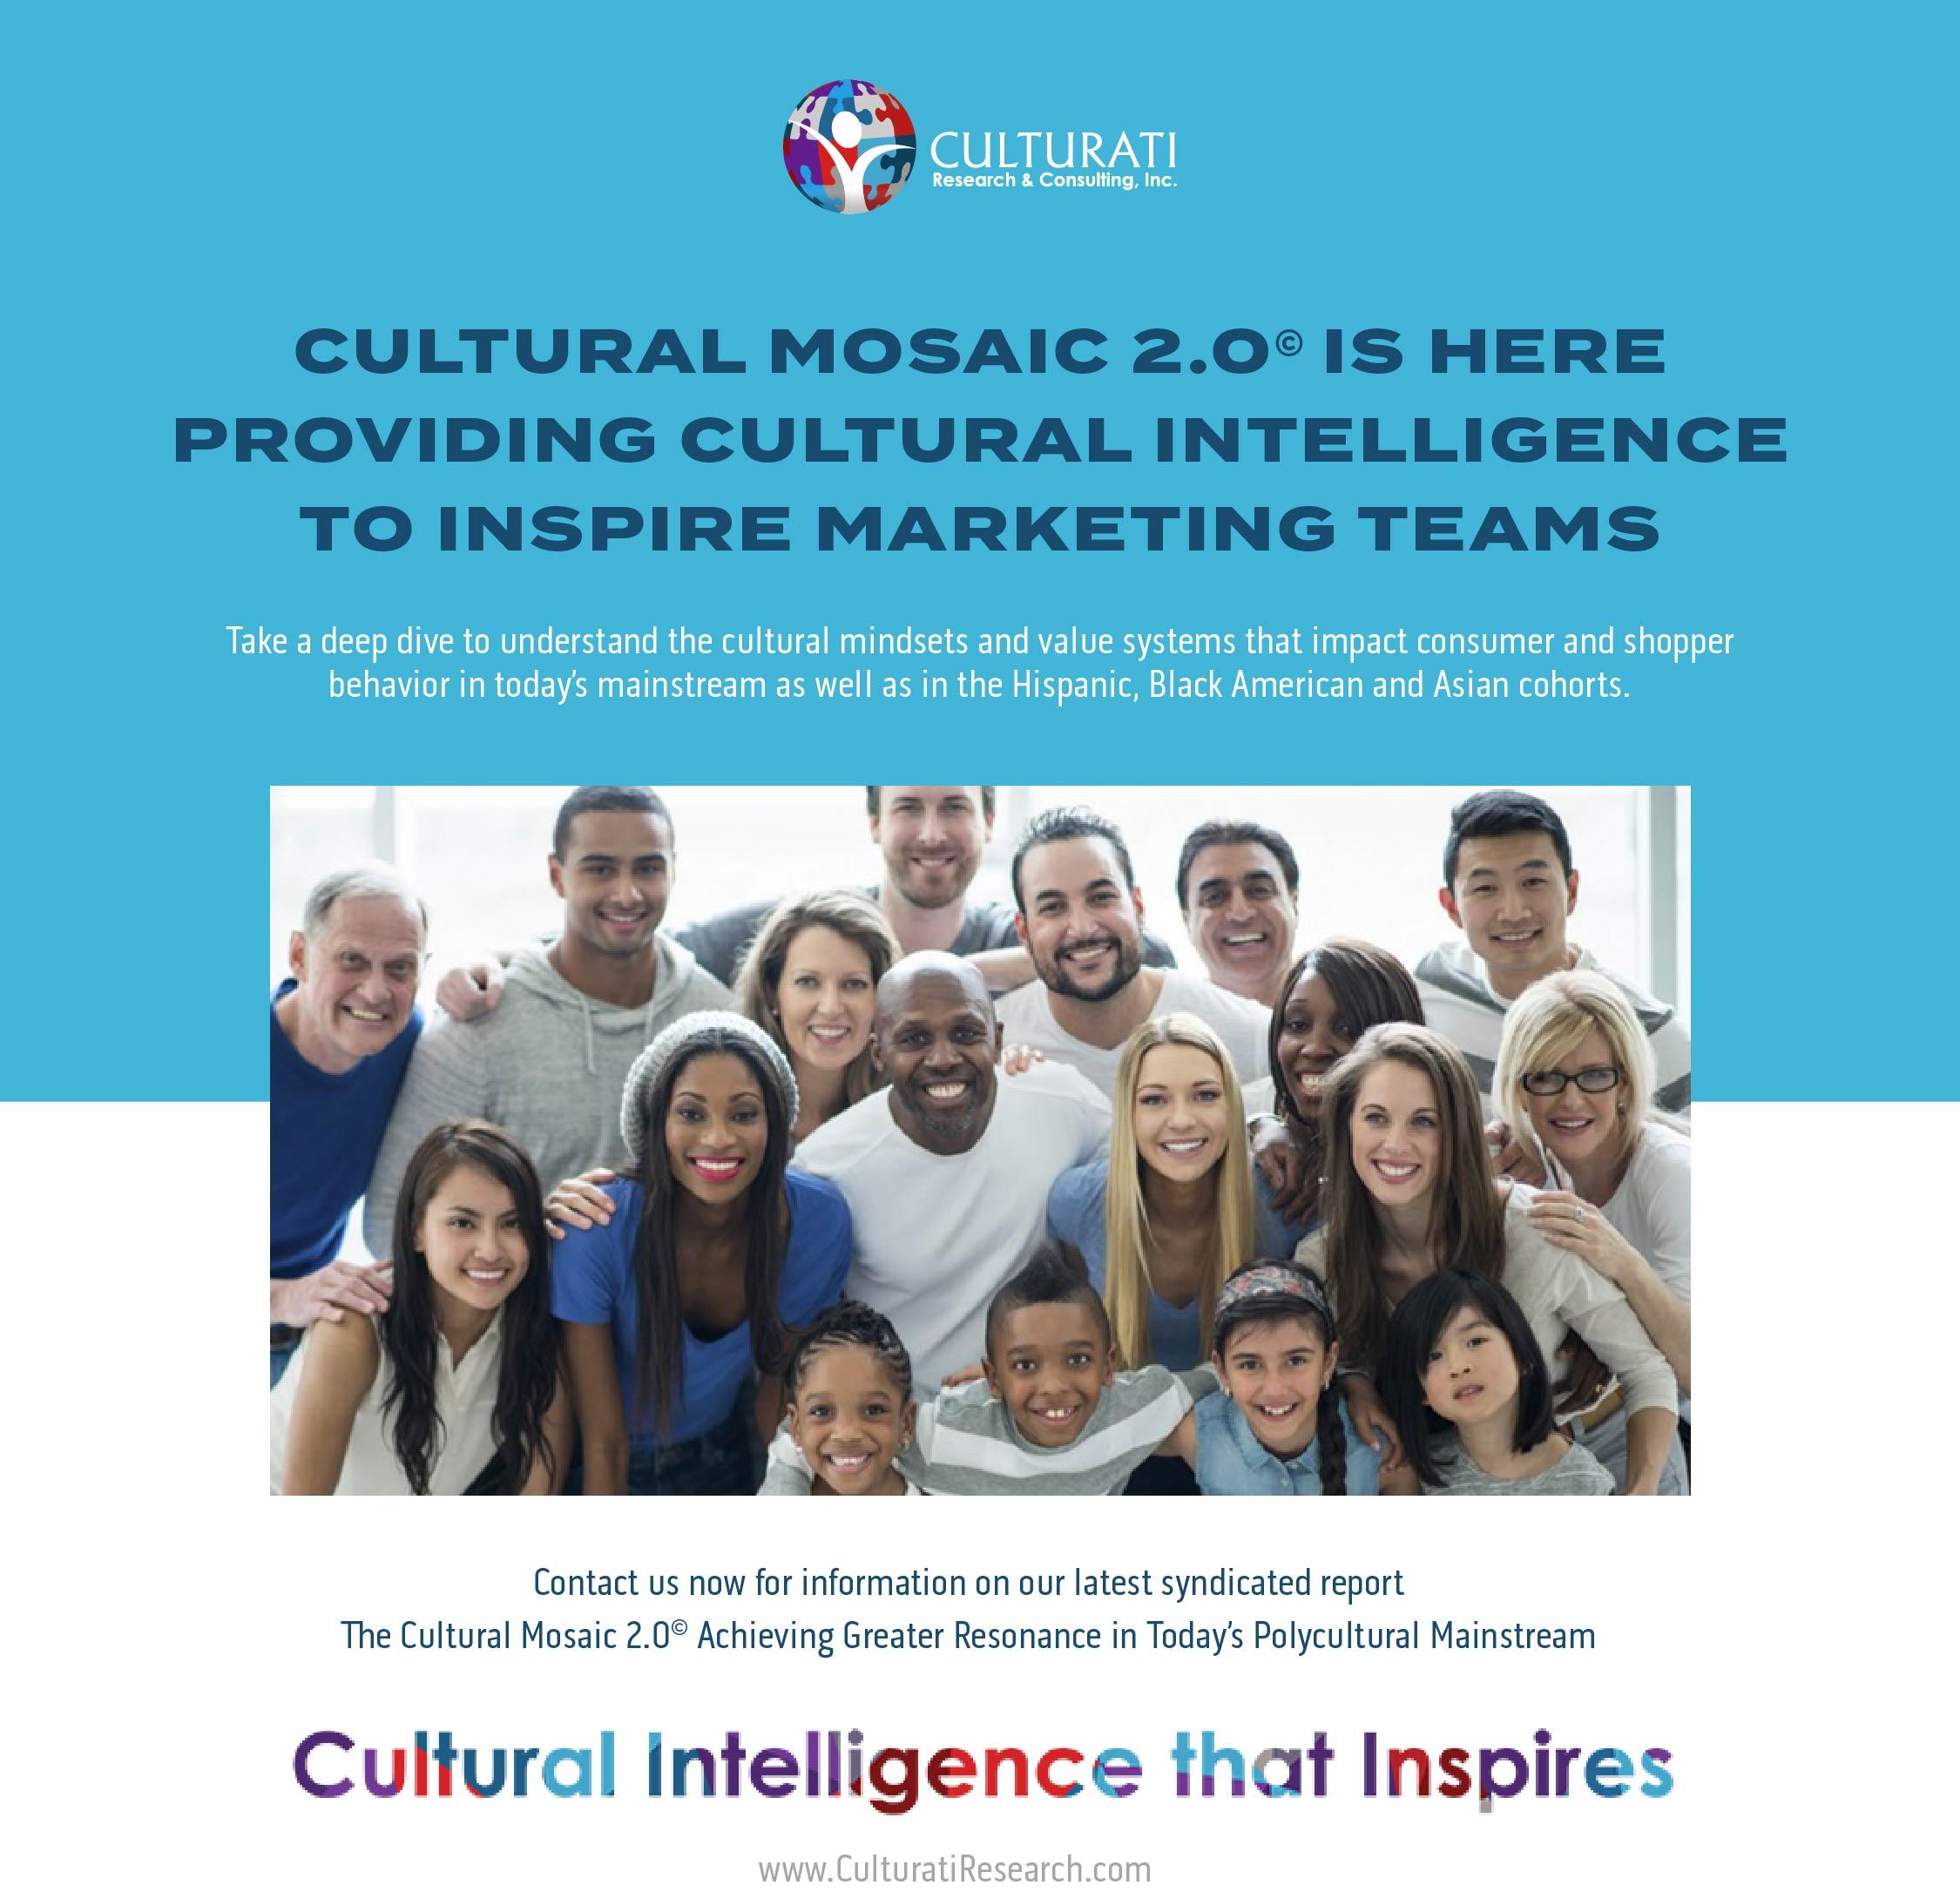 Cultural Mosaic 2